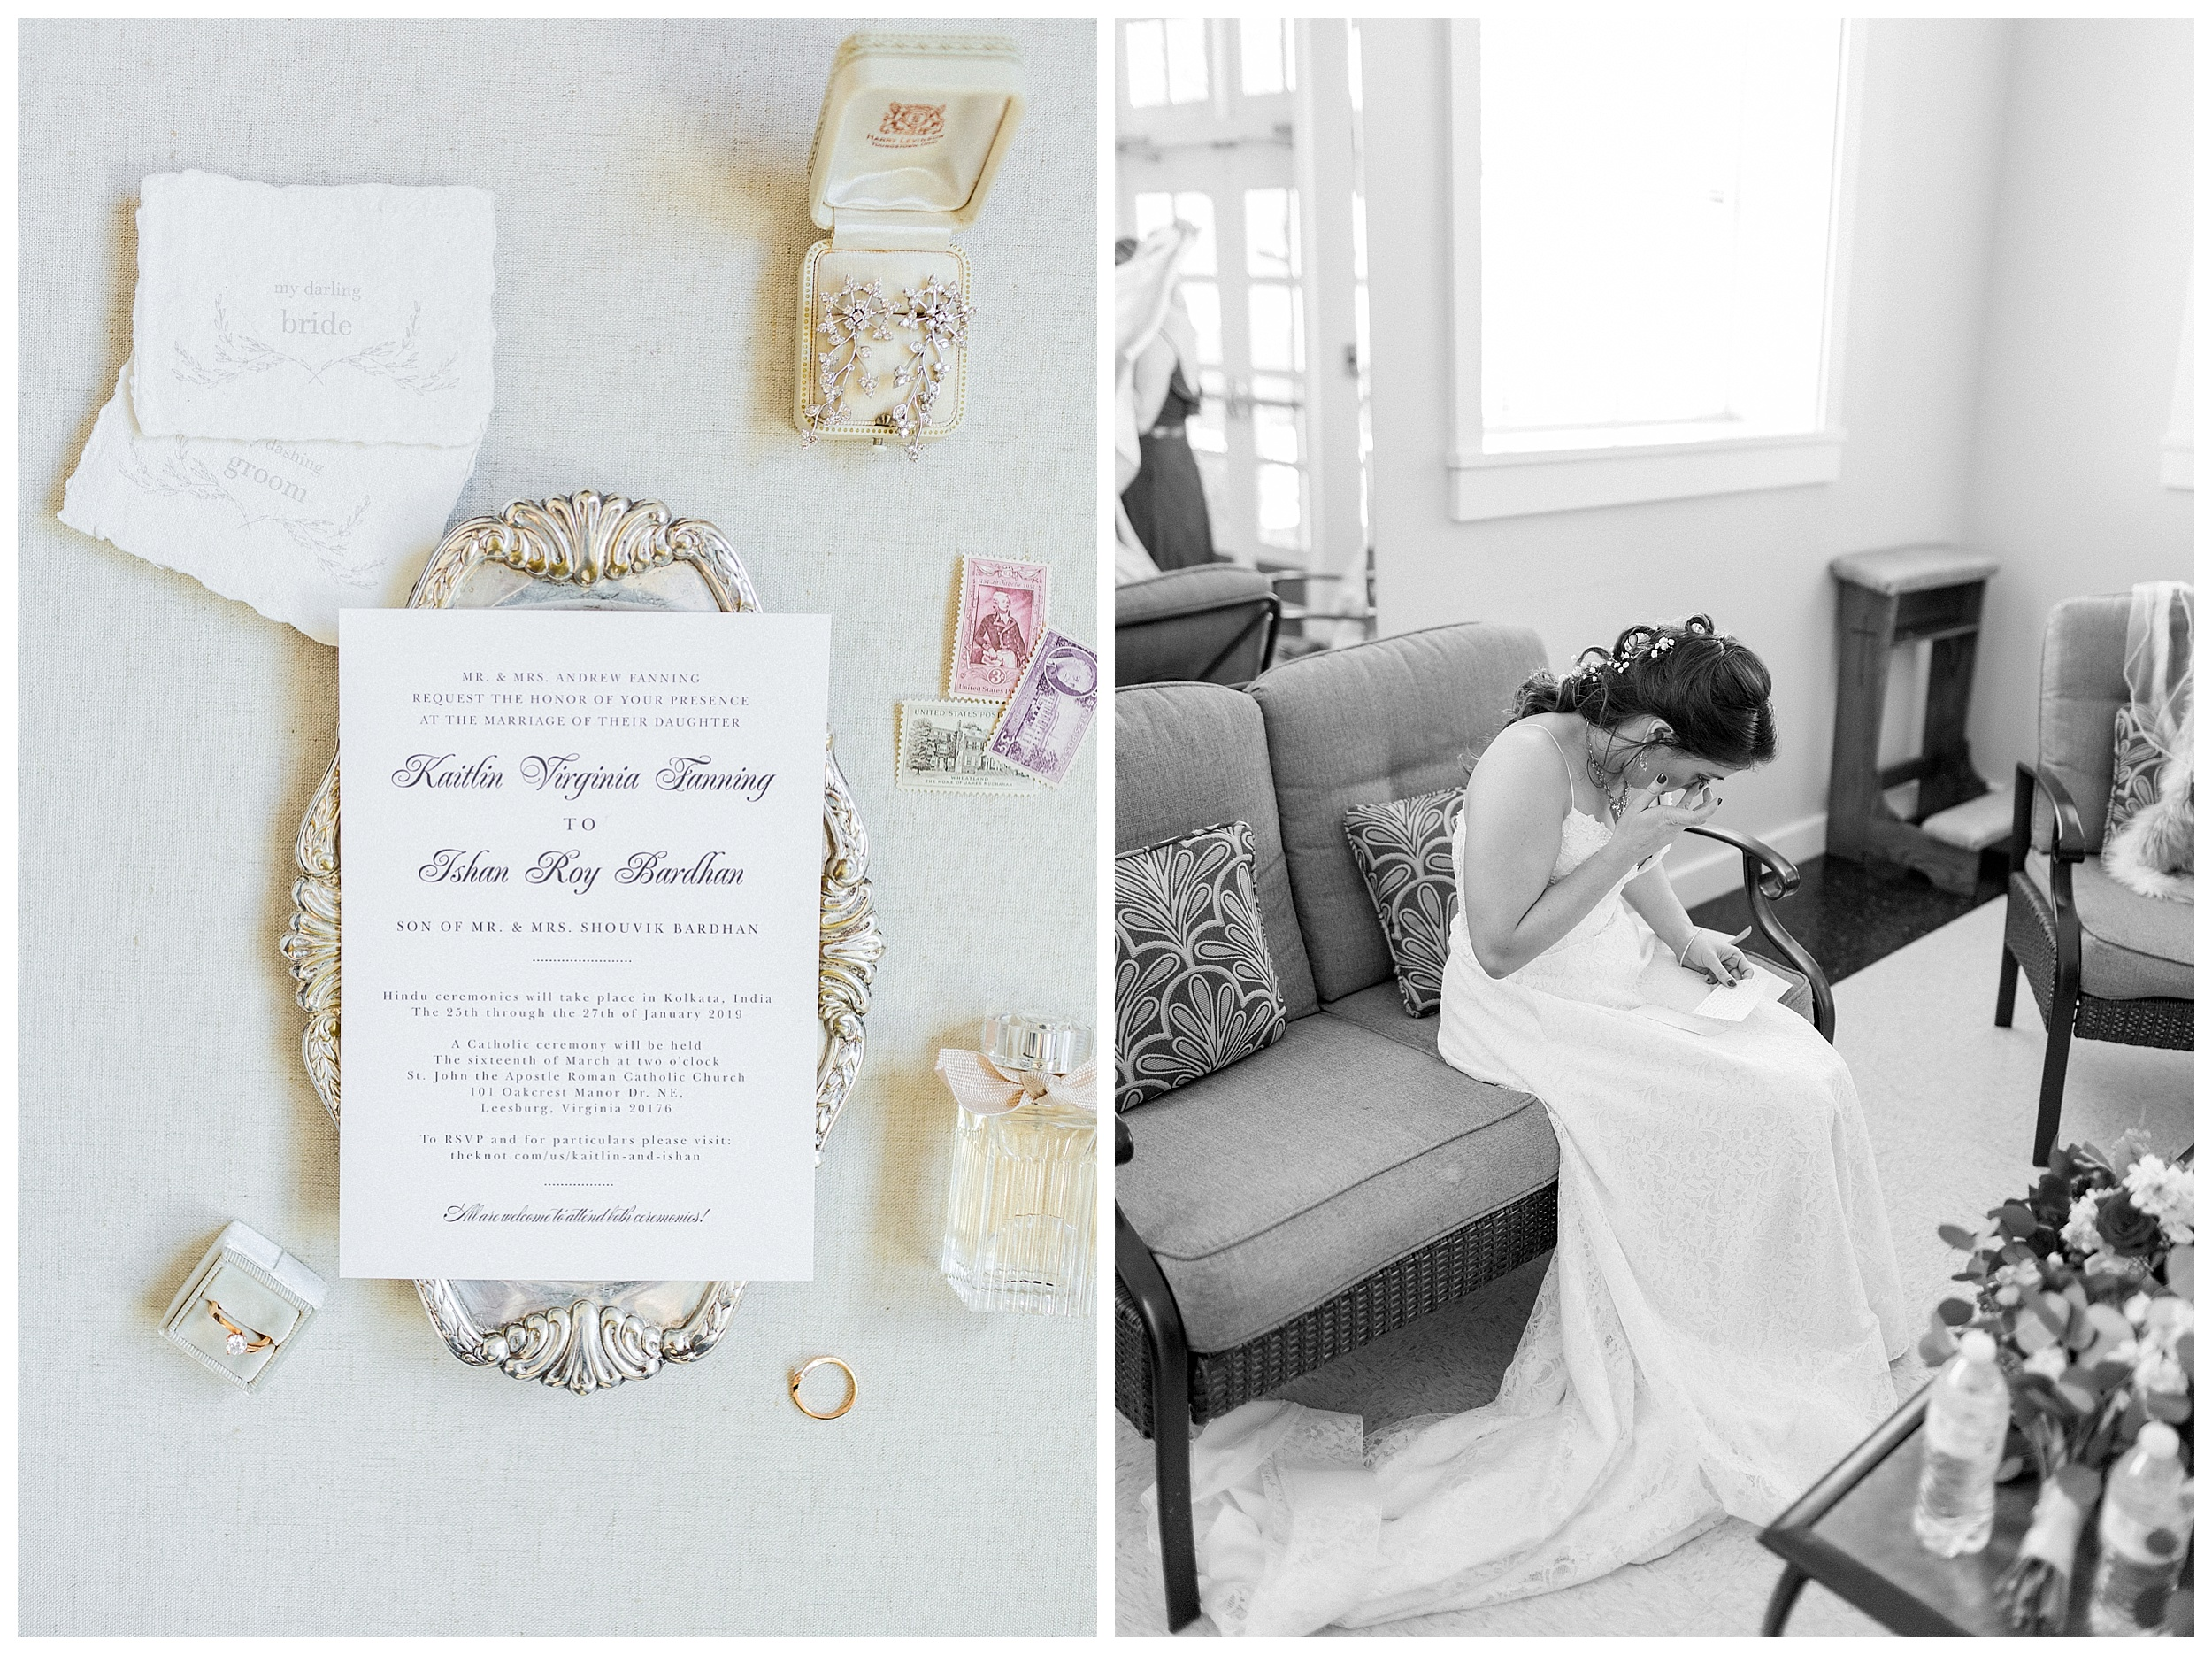 Stone Tower Winery Wedding | Virginia Winter Wedding | VA Wedding Photographer Kir Tuben_0034.jpg